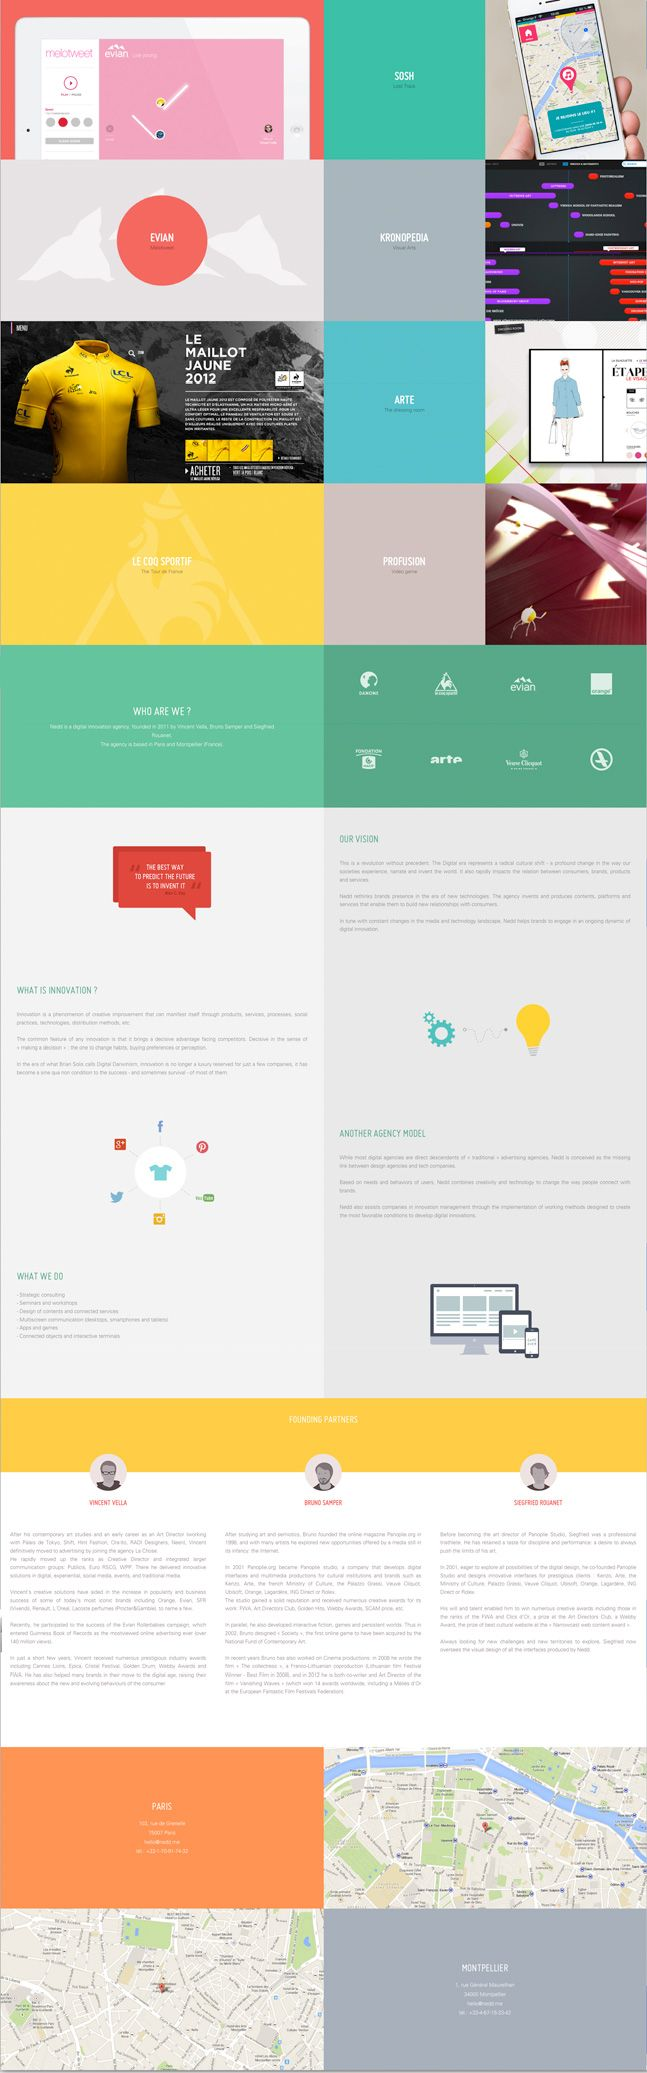 Winner 26 September 2013 Nedd by Nedd http://www.cssdesignawards.com/css-web-design-award-winner.php?id=22993 Nedd is a digital innovation agency based in Paris and Montpellier (France). #Responsive #Scroll #FlatDesign